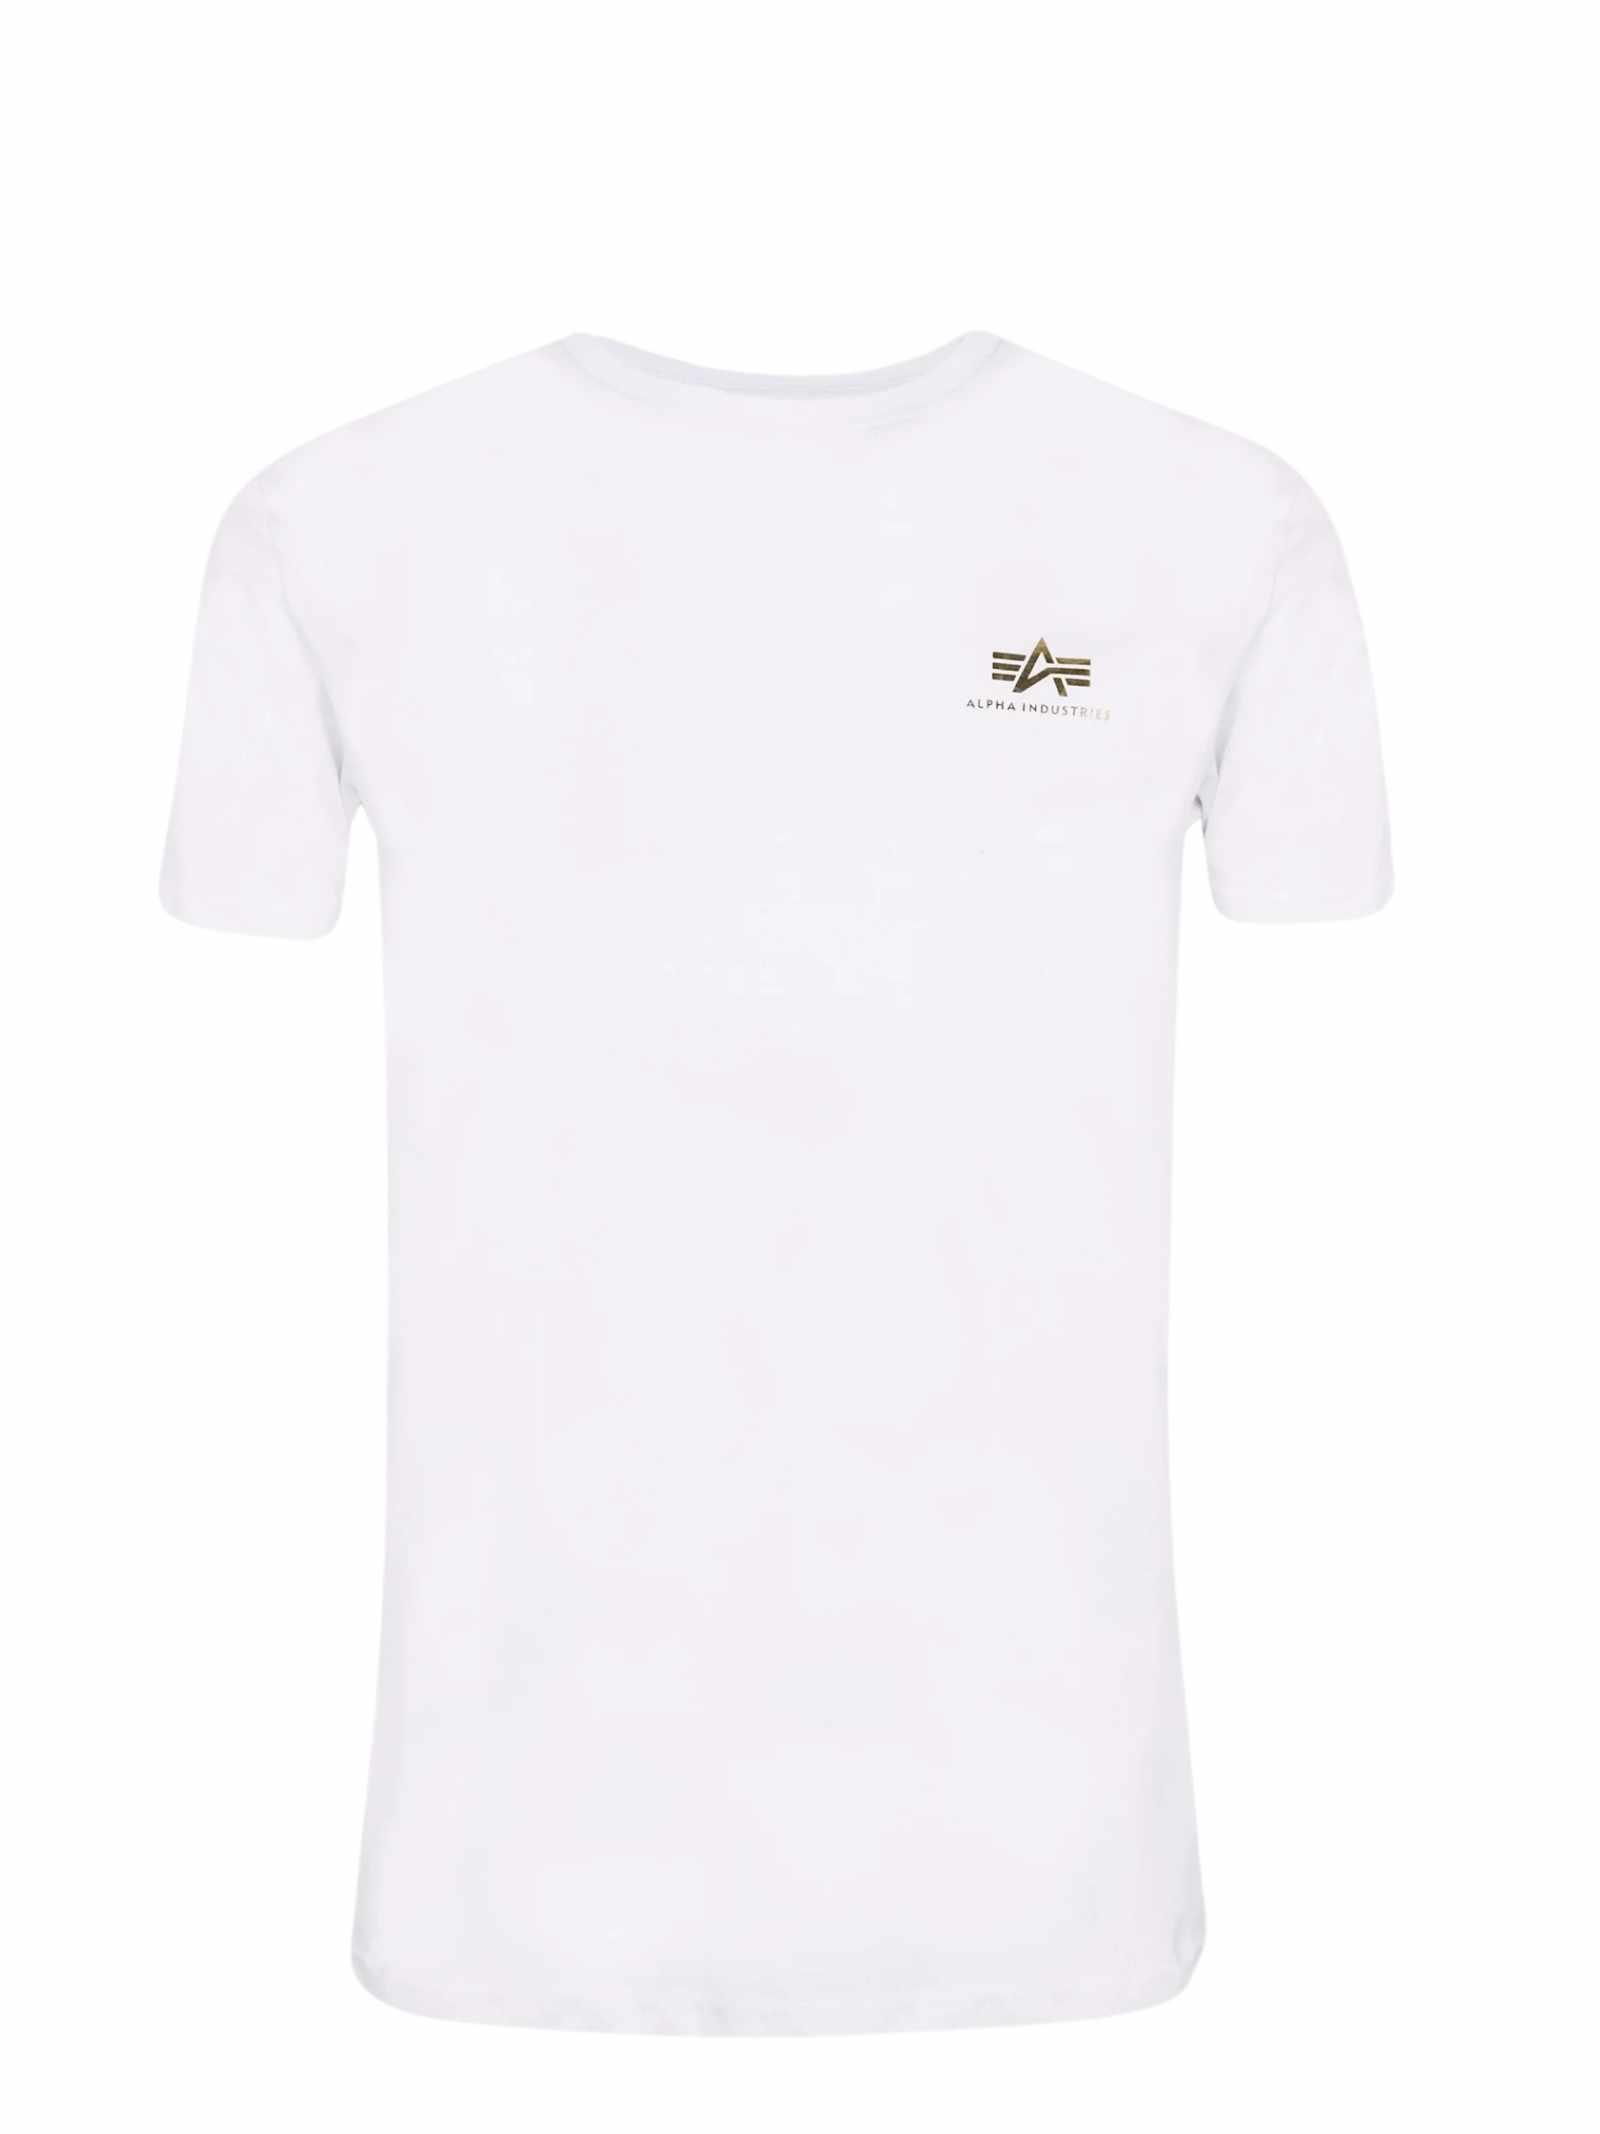 T-shirt bianca girocollo con logo oro ALPHA INDUSTRIES   T-shirt   188505FP590